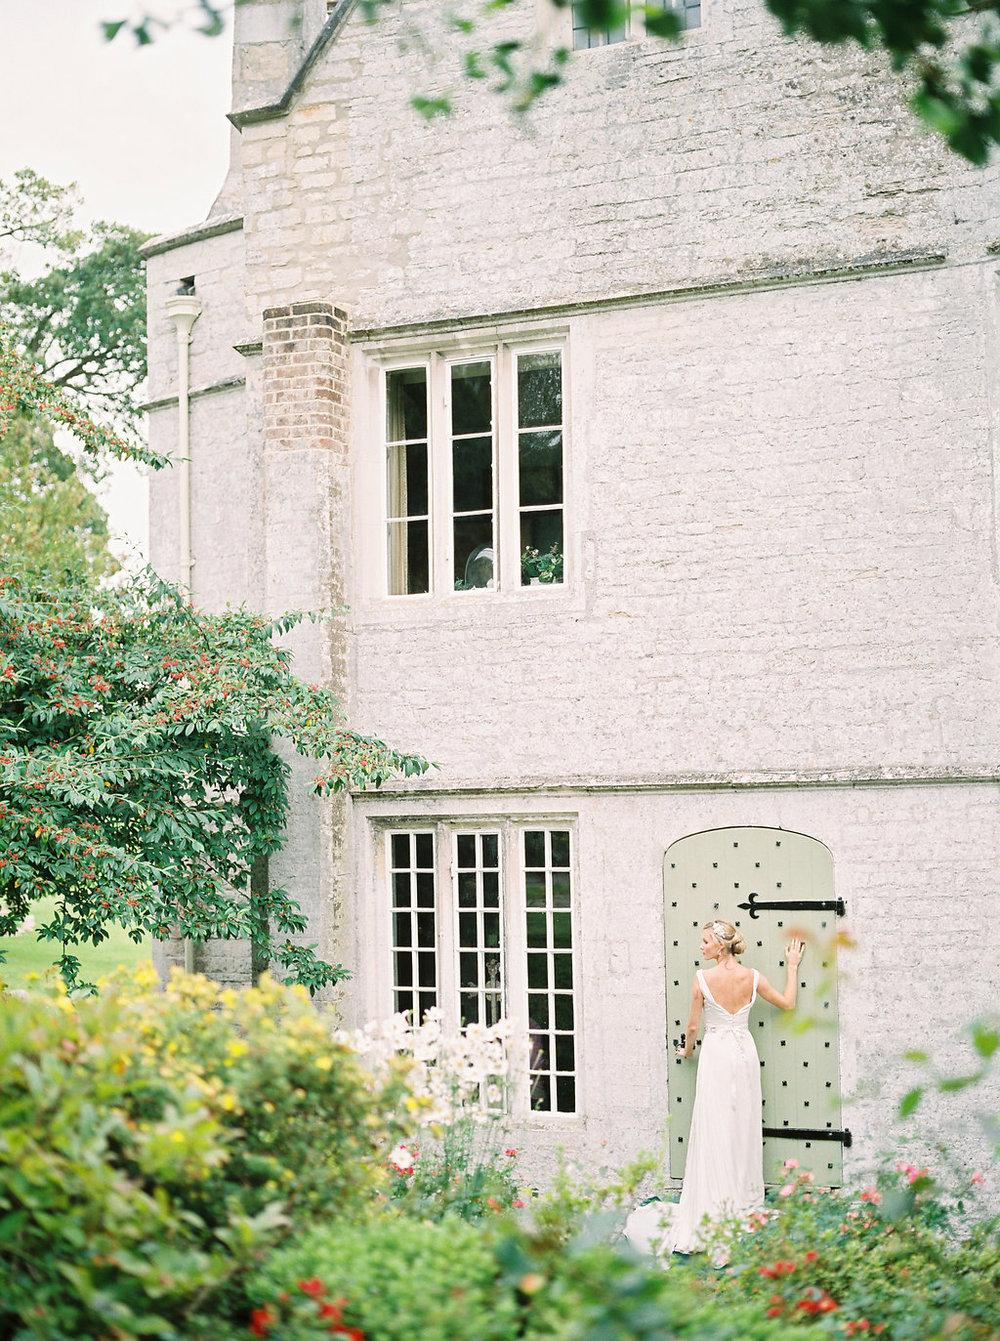 warmwell house wedding venue in dorset photo by imogen xiana